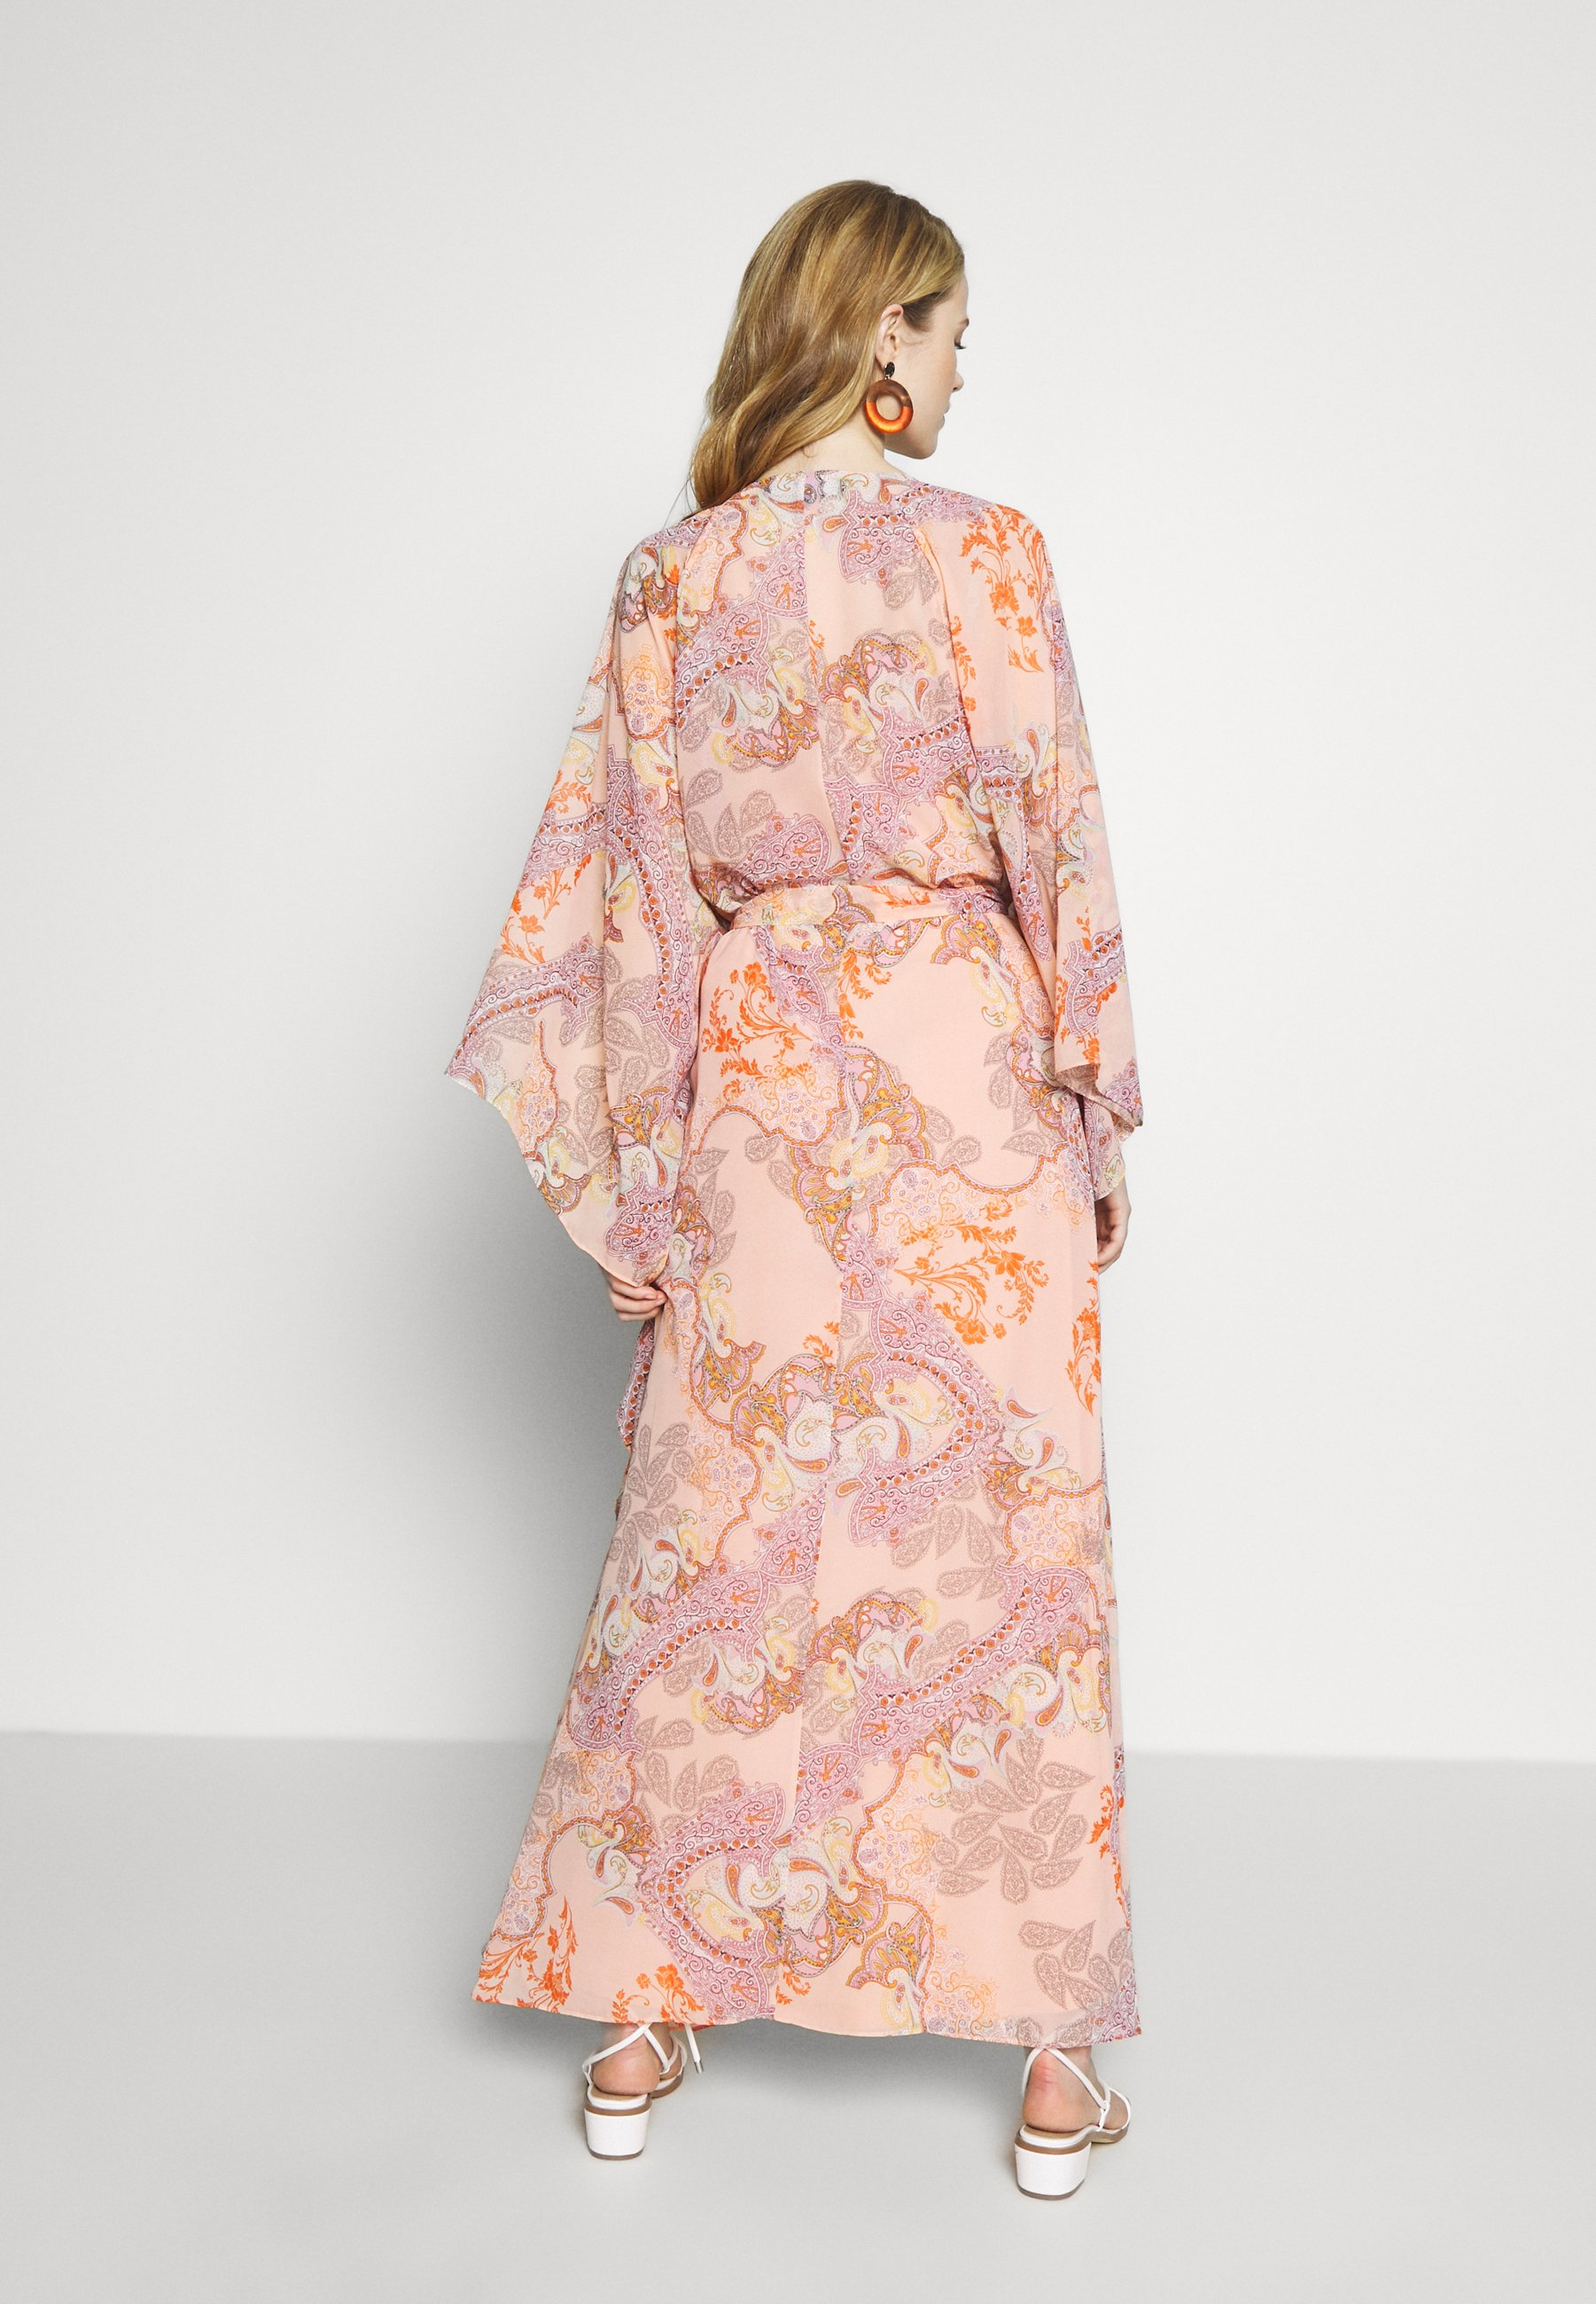 Niedrogi Duża obniżka Ilse Jacobsen LUMY - Długa sukienka - coral blush | Odzież damska 2020 NitOt